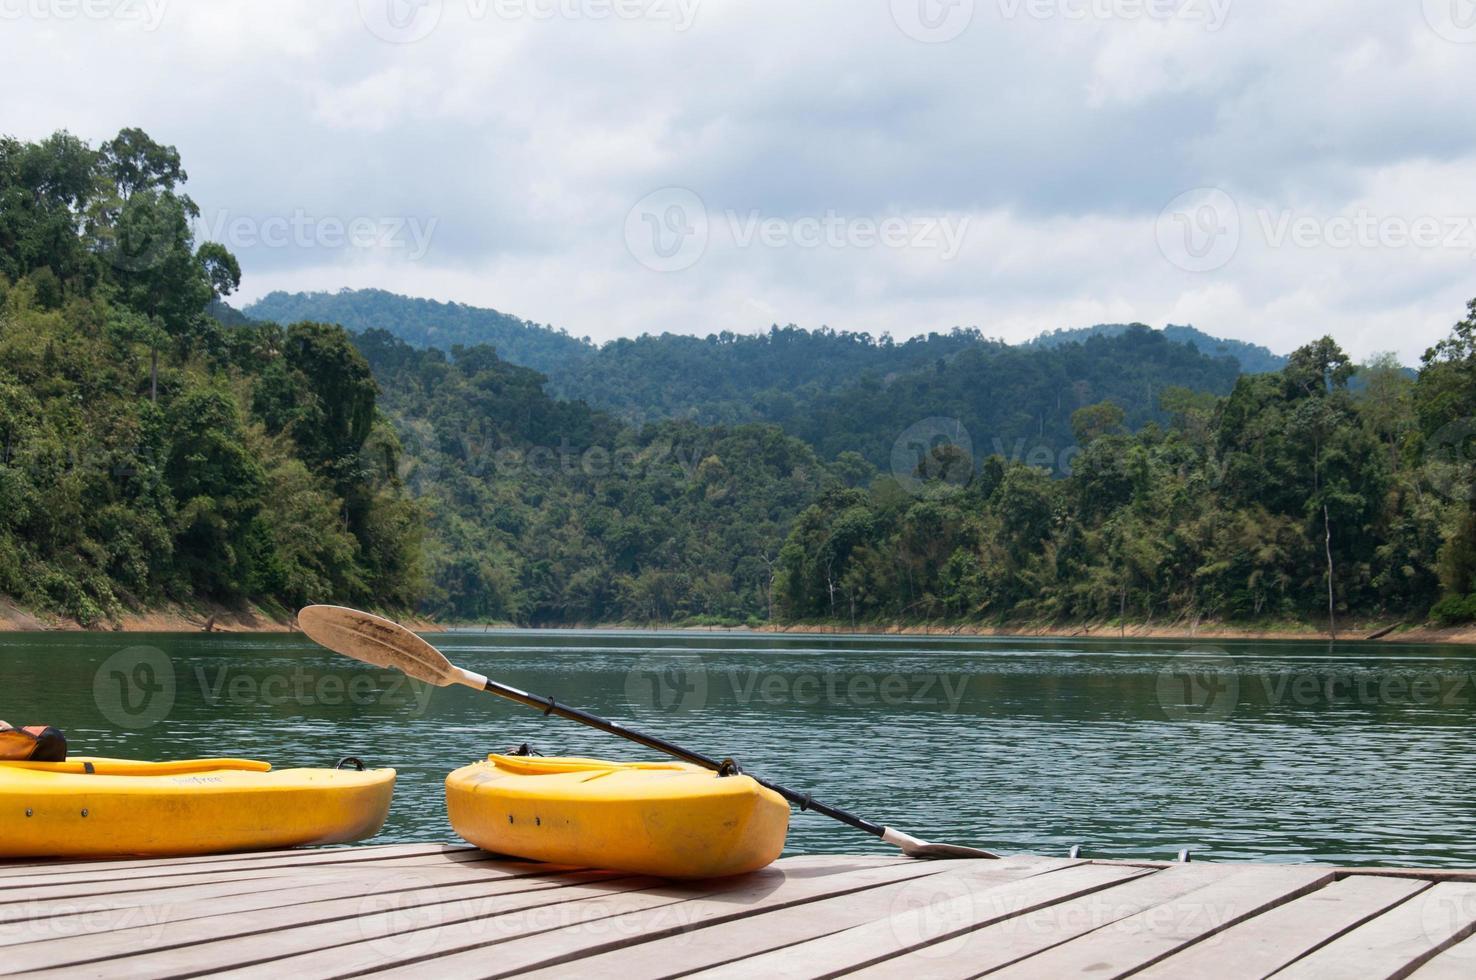 Kanu auf dem See foto